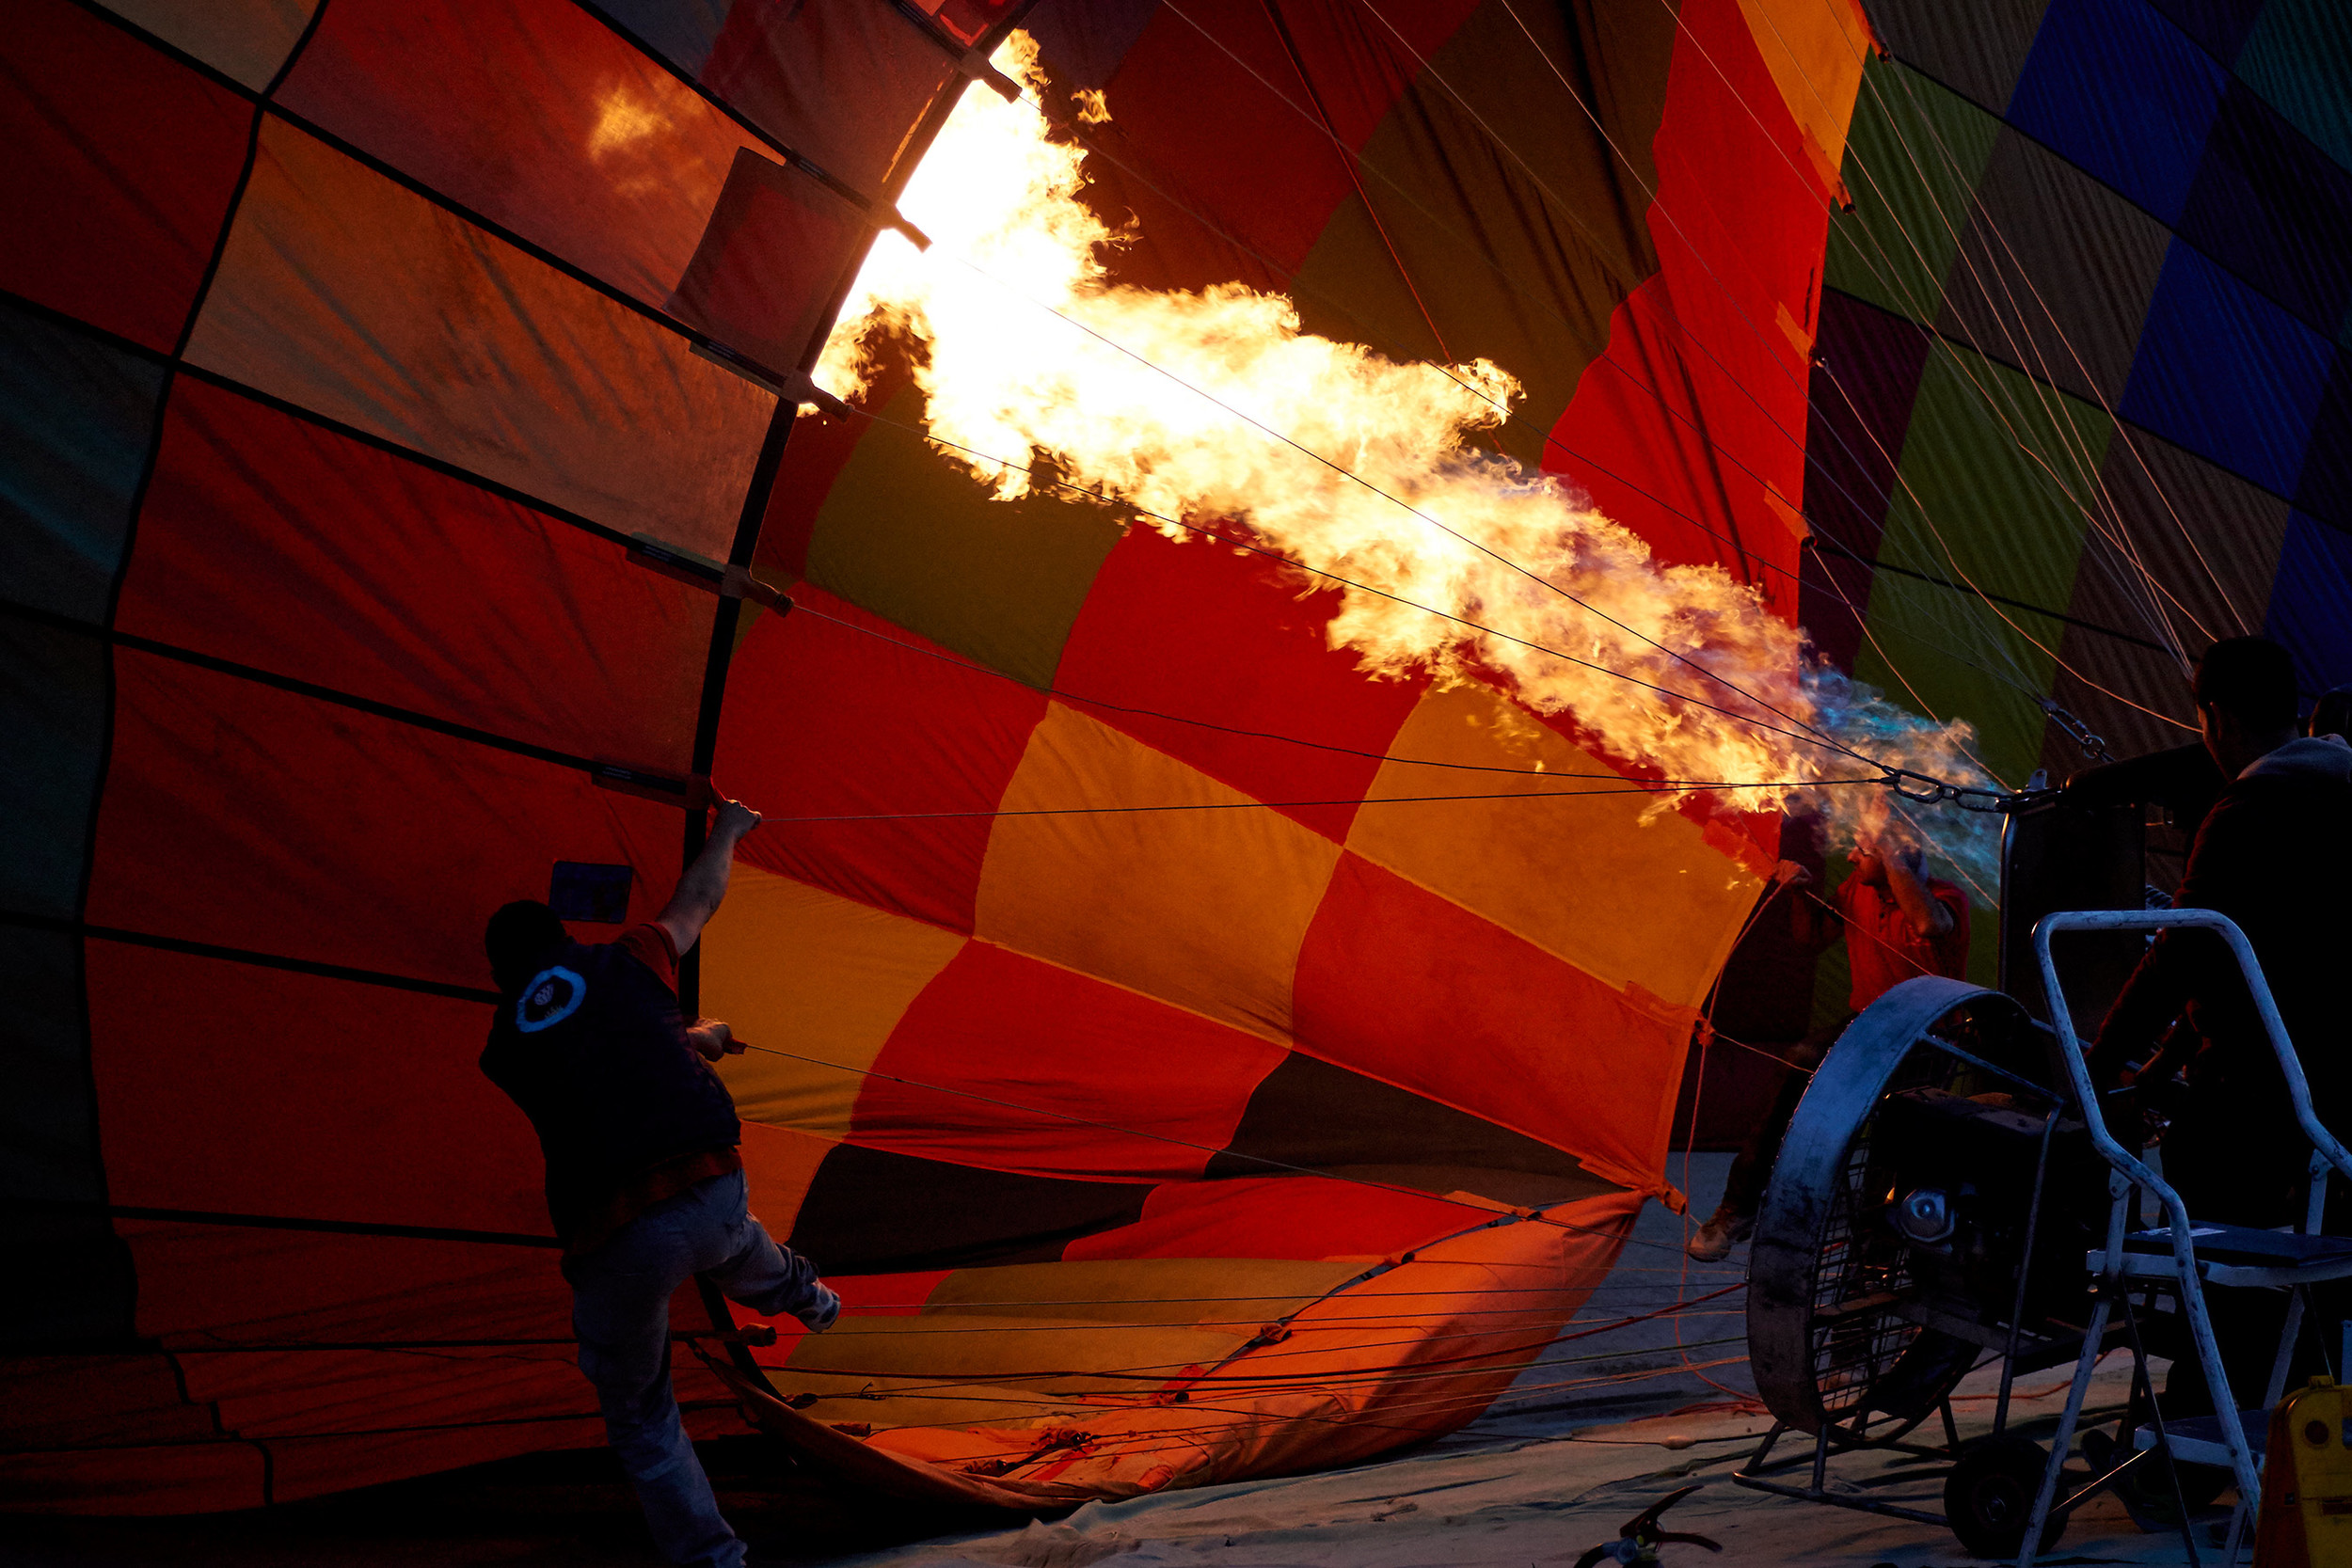 Man filling balloon with hot air, Cappadocia